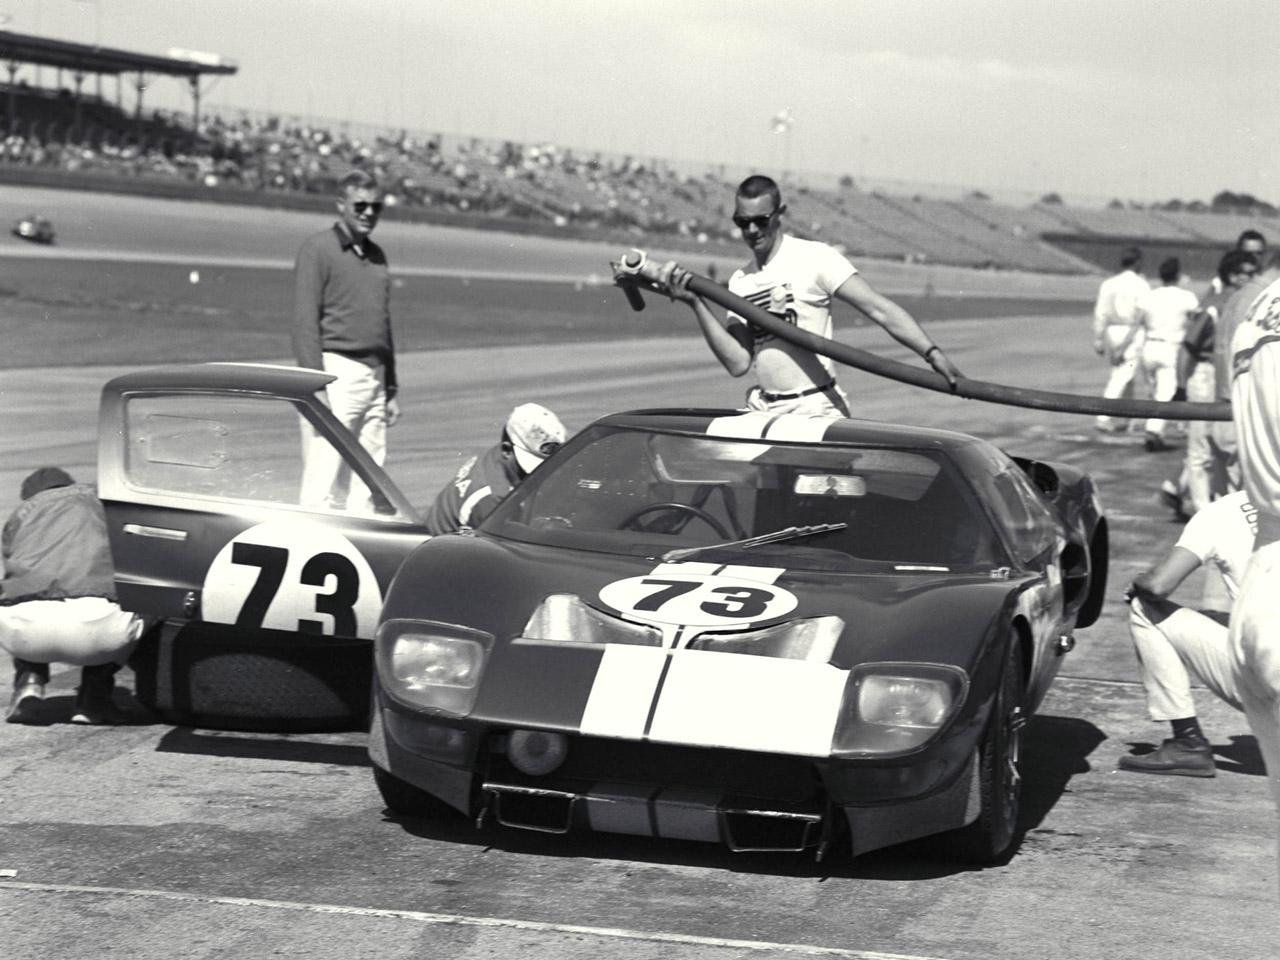 Ford GT40 1964 foto - 1